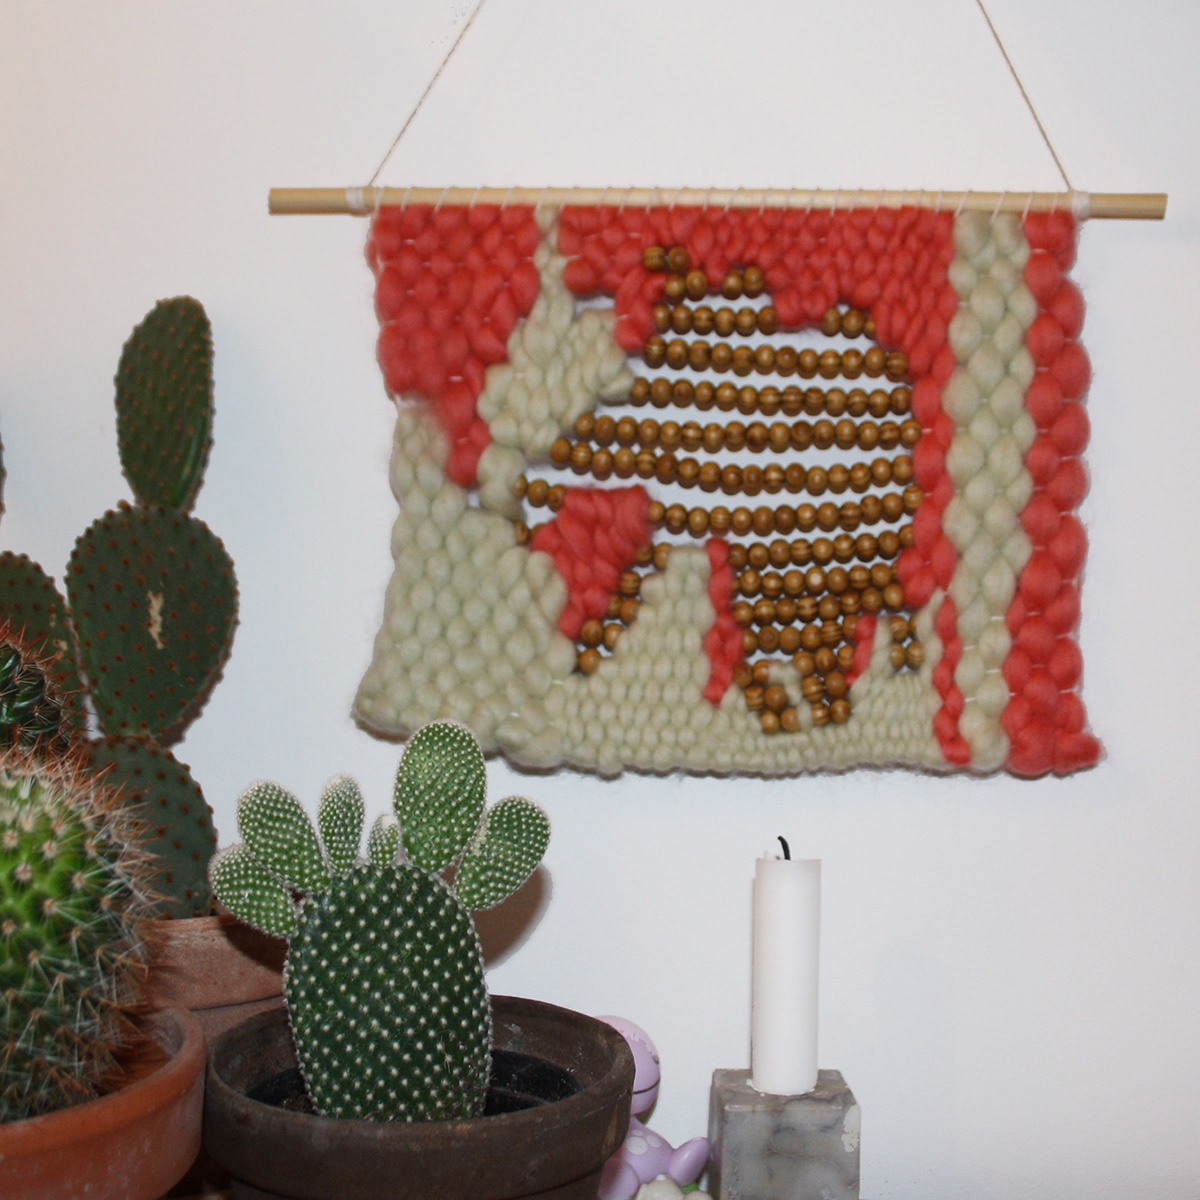 Wallhangings weaving textile art copenhagen beads thread